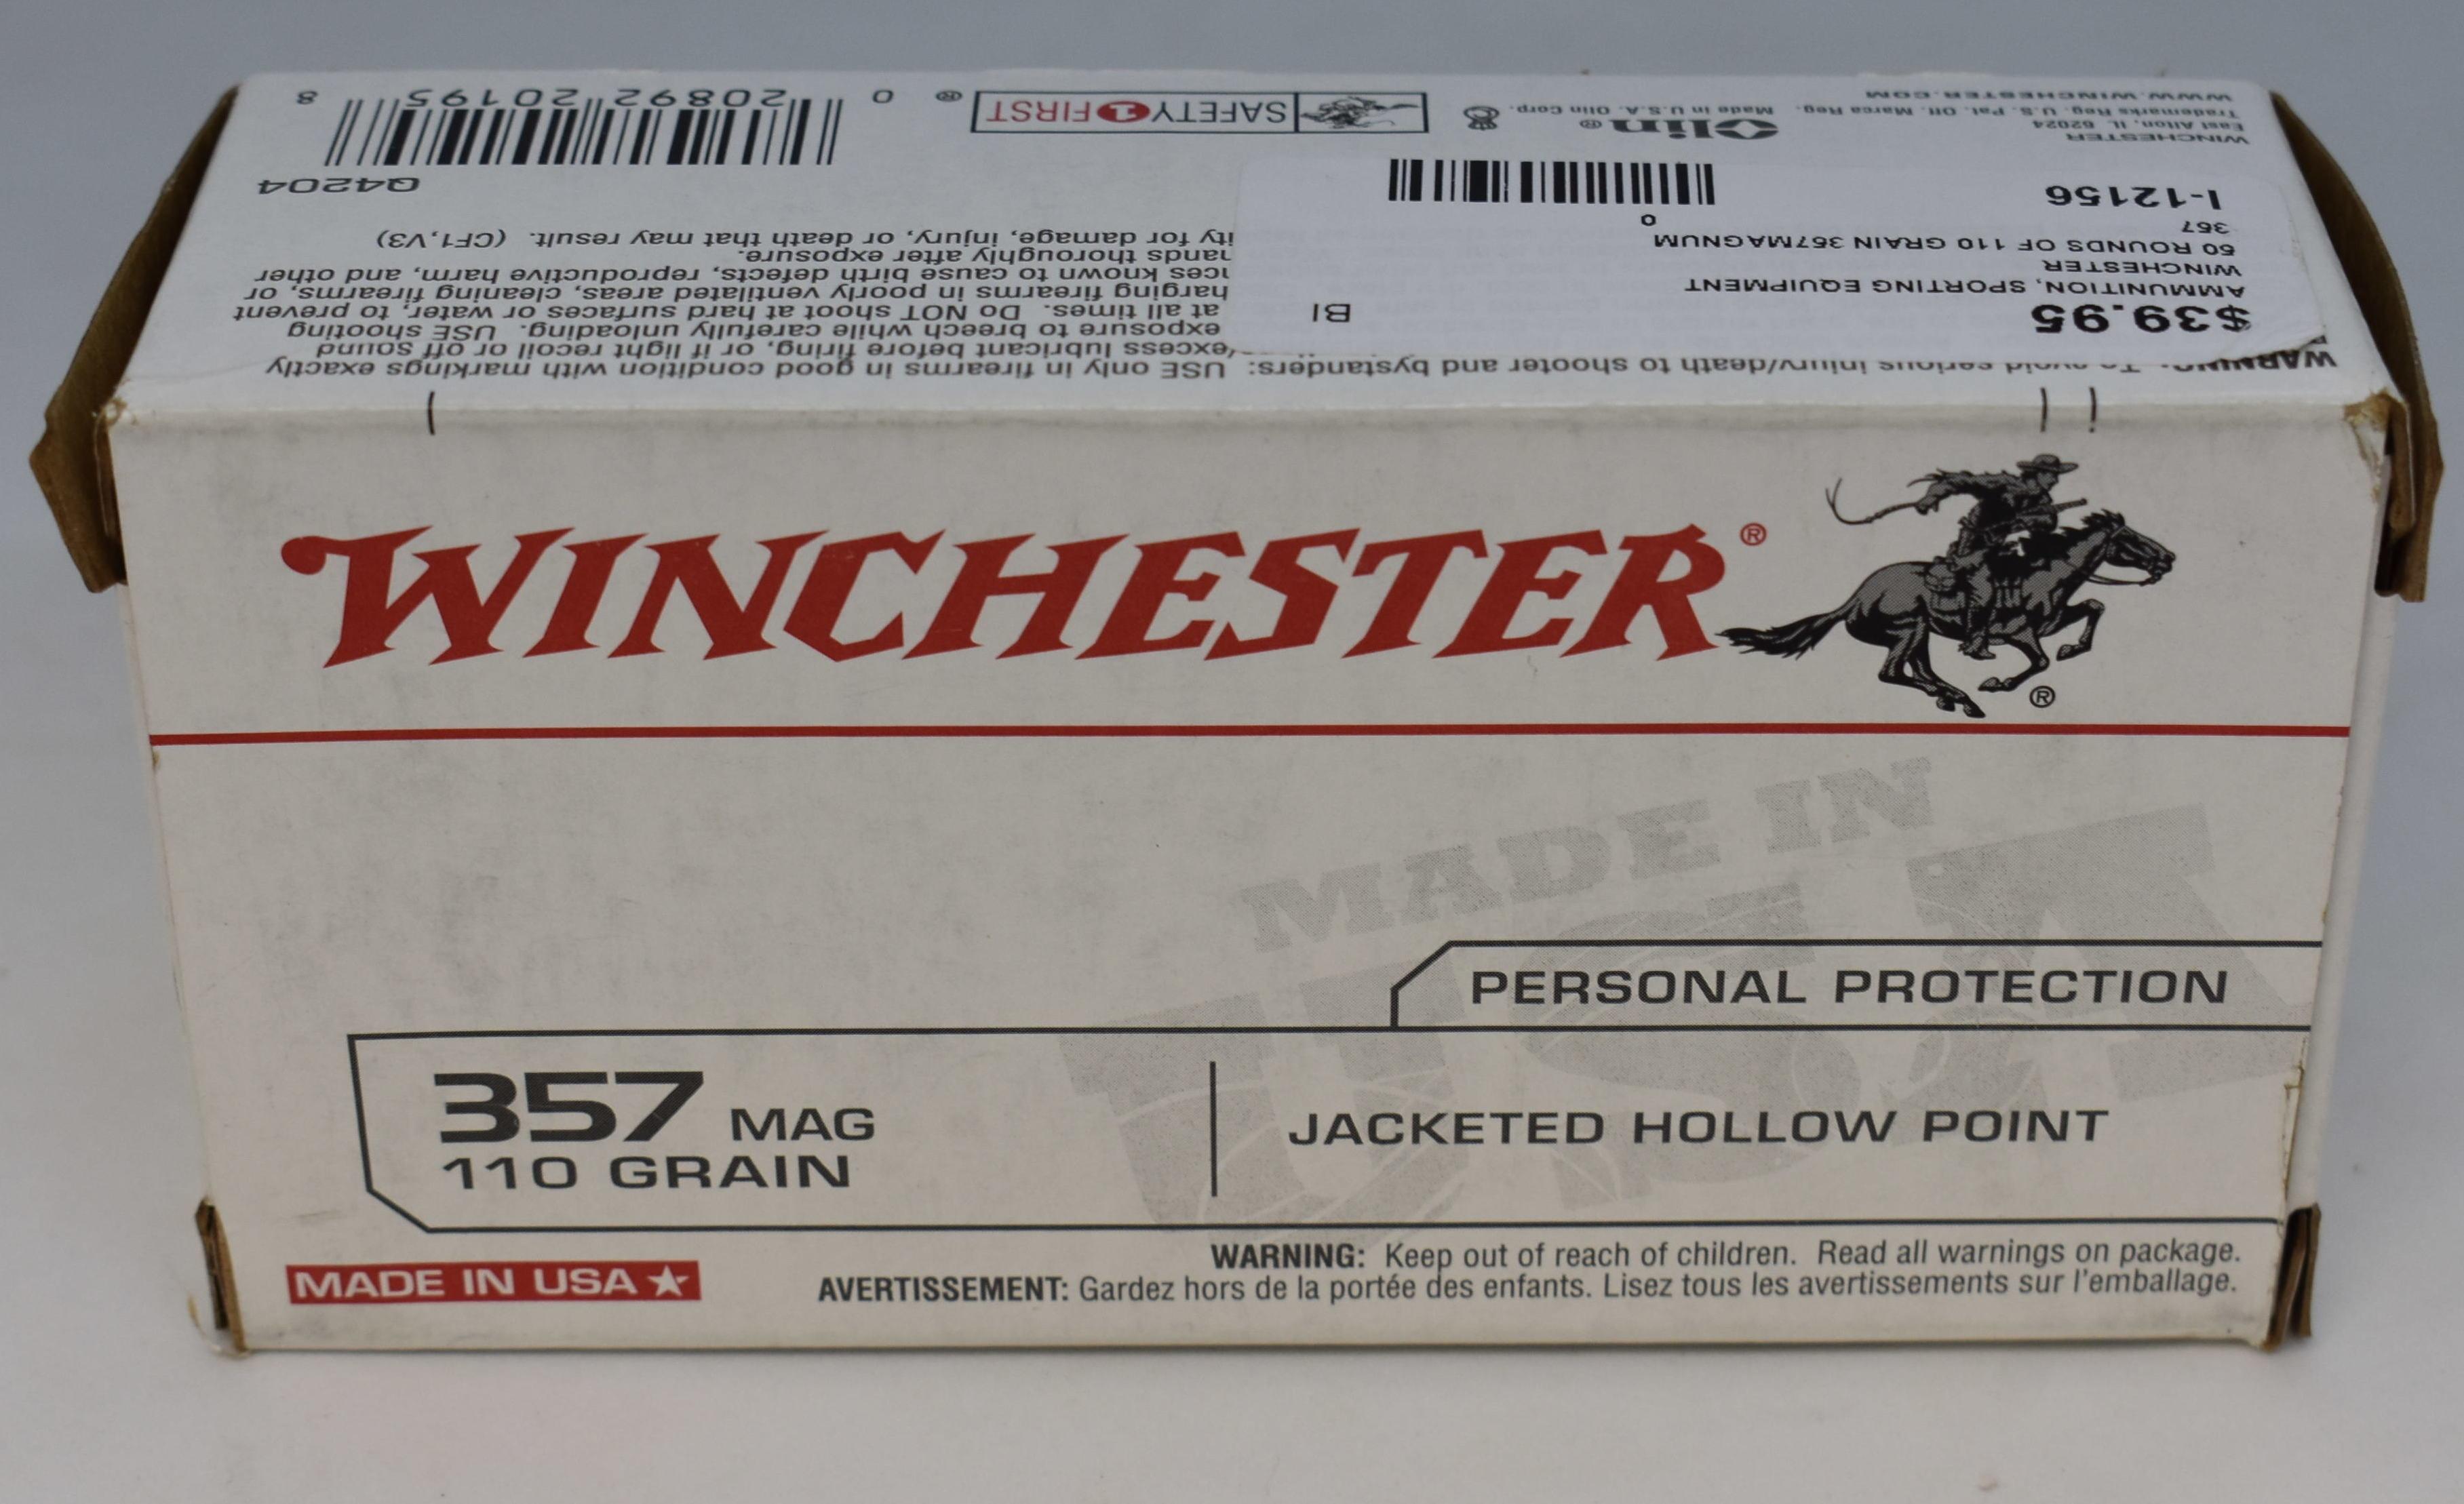 WINCHESTER - 357 - AMMUNITION SPORTING EQUIPMENT